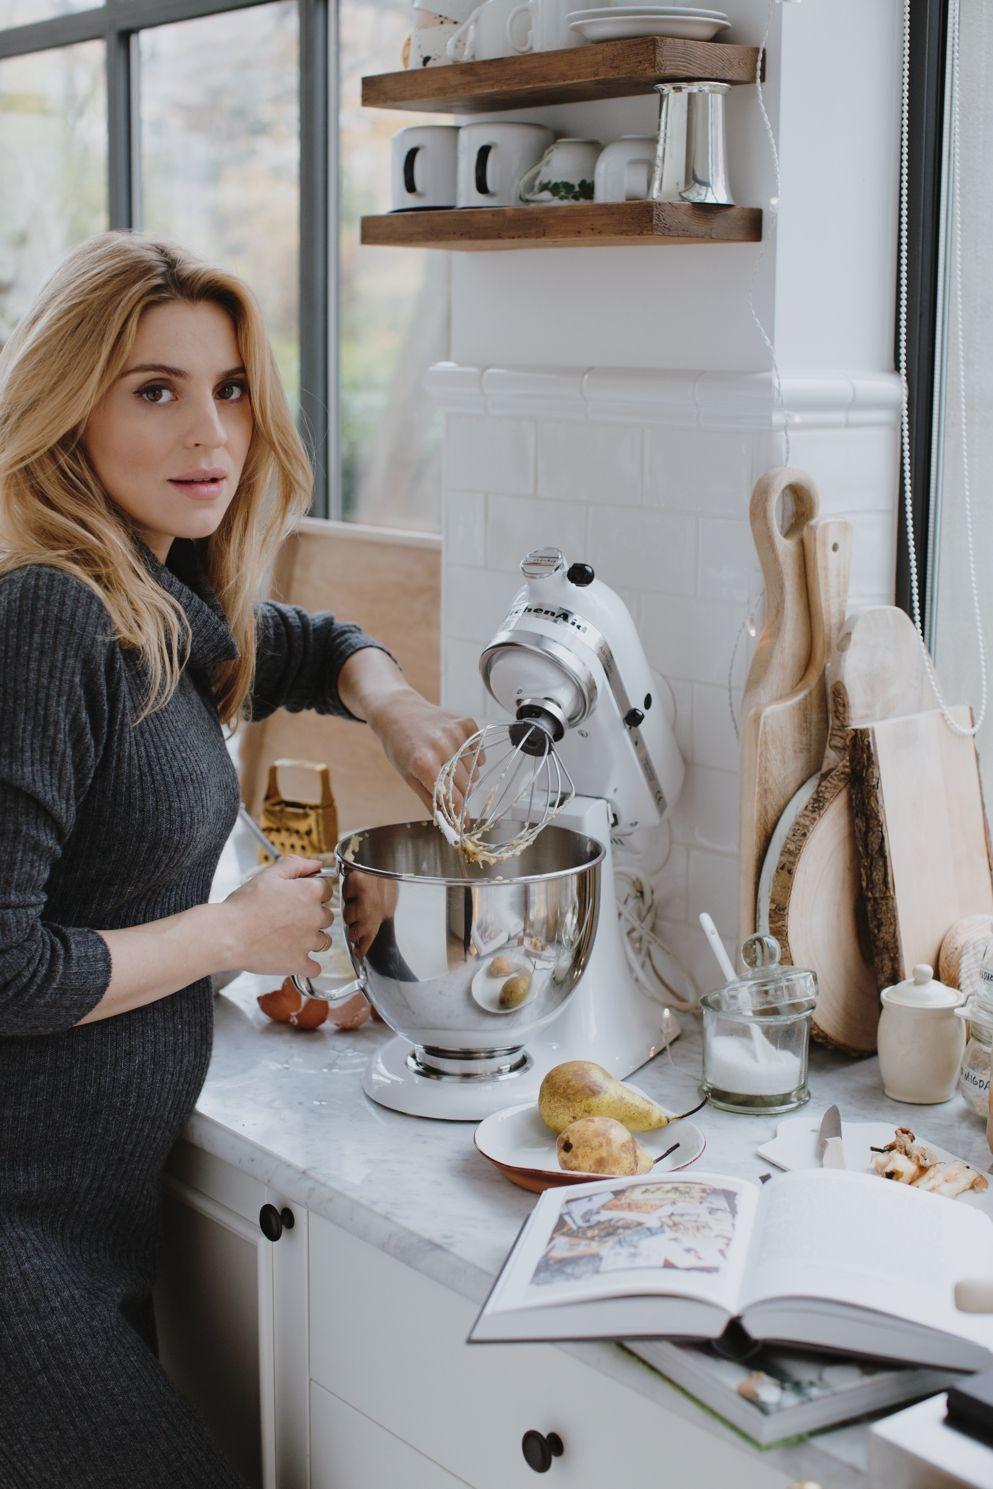 Pin By Malgorzata Zdunczyk On Style Cooking Photos Branding Photoshoot Food Photography Inspiration